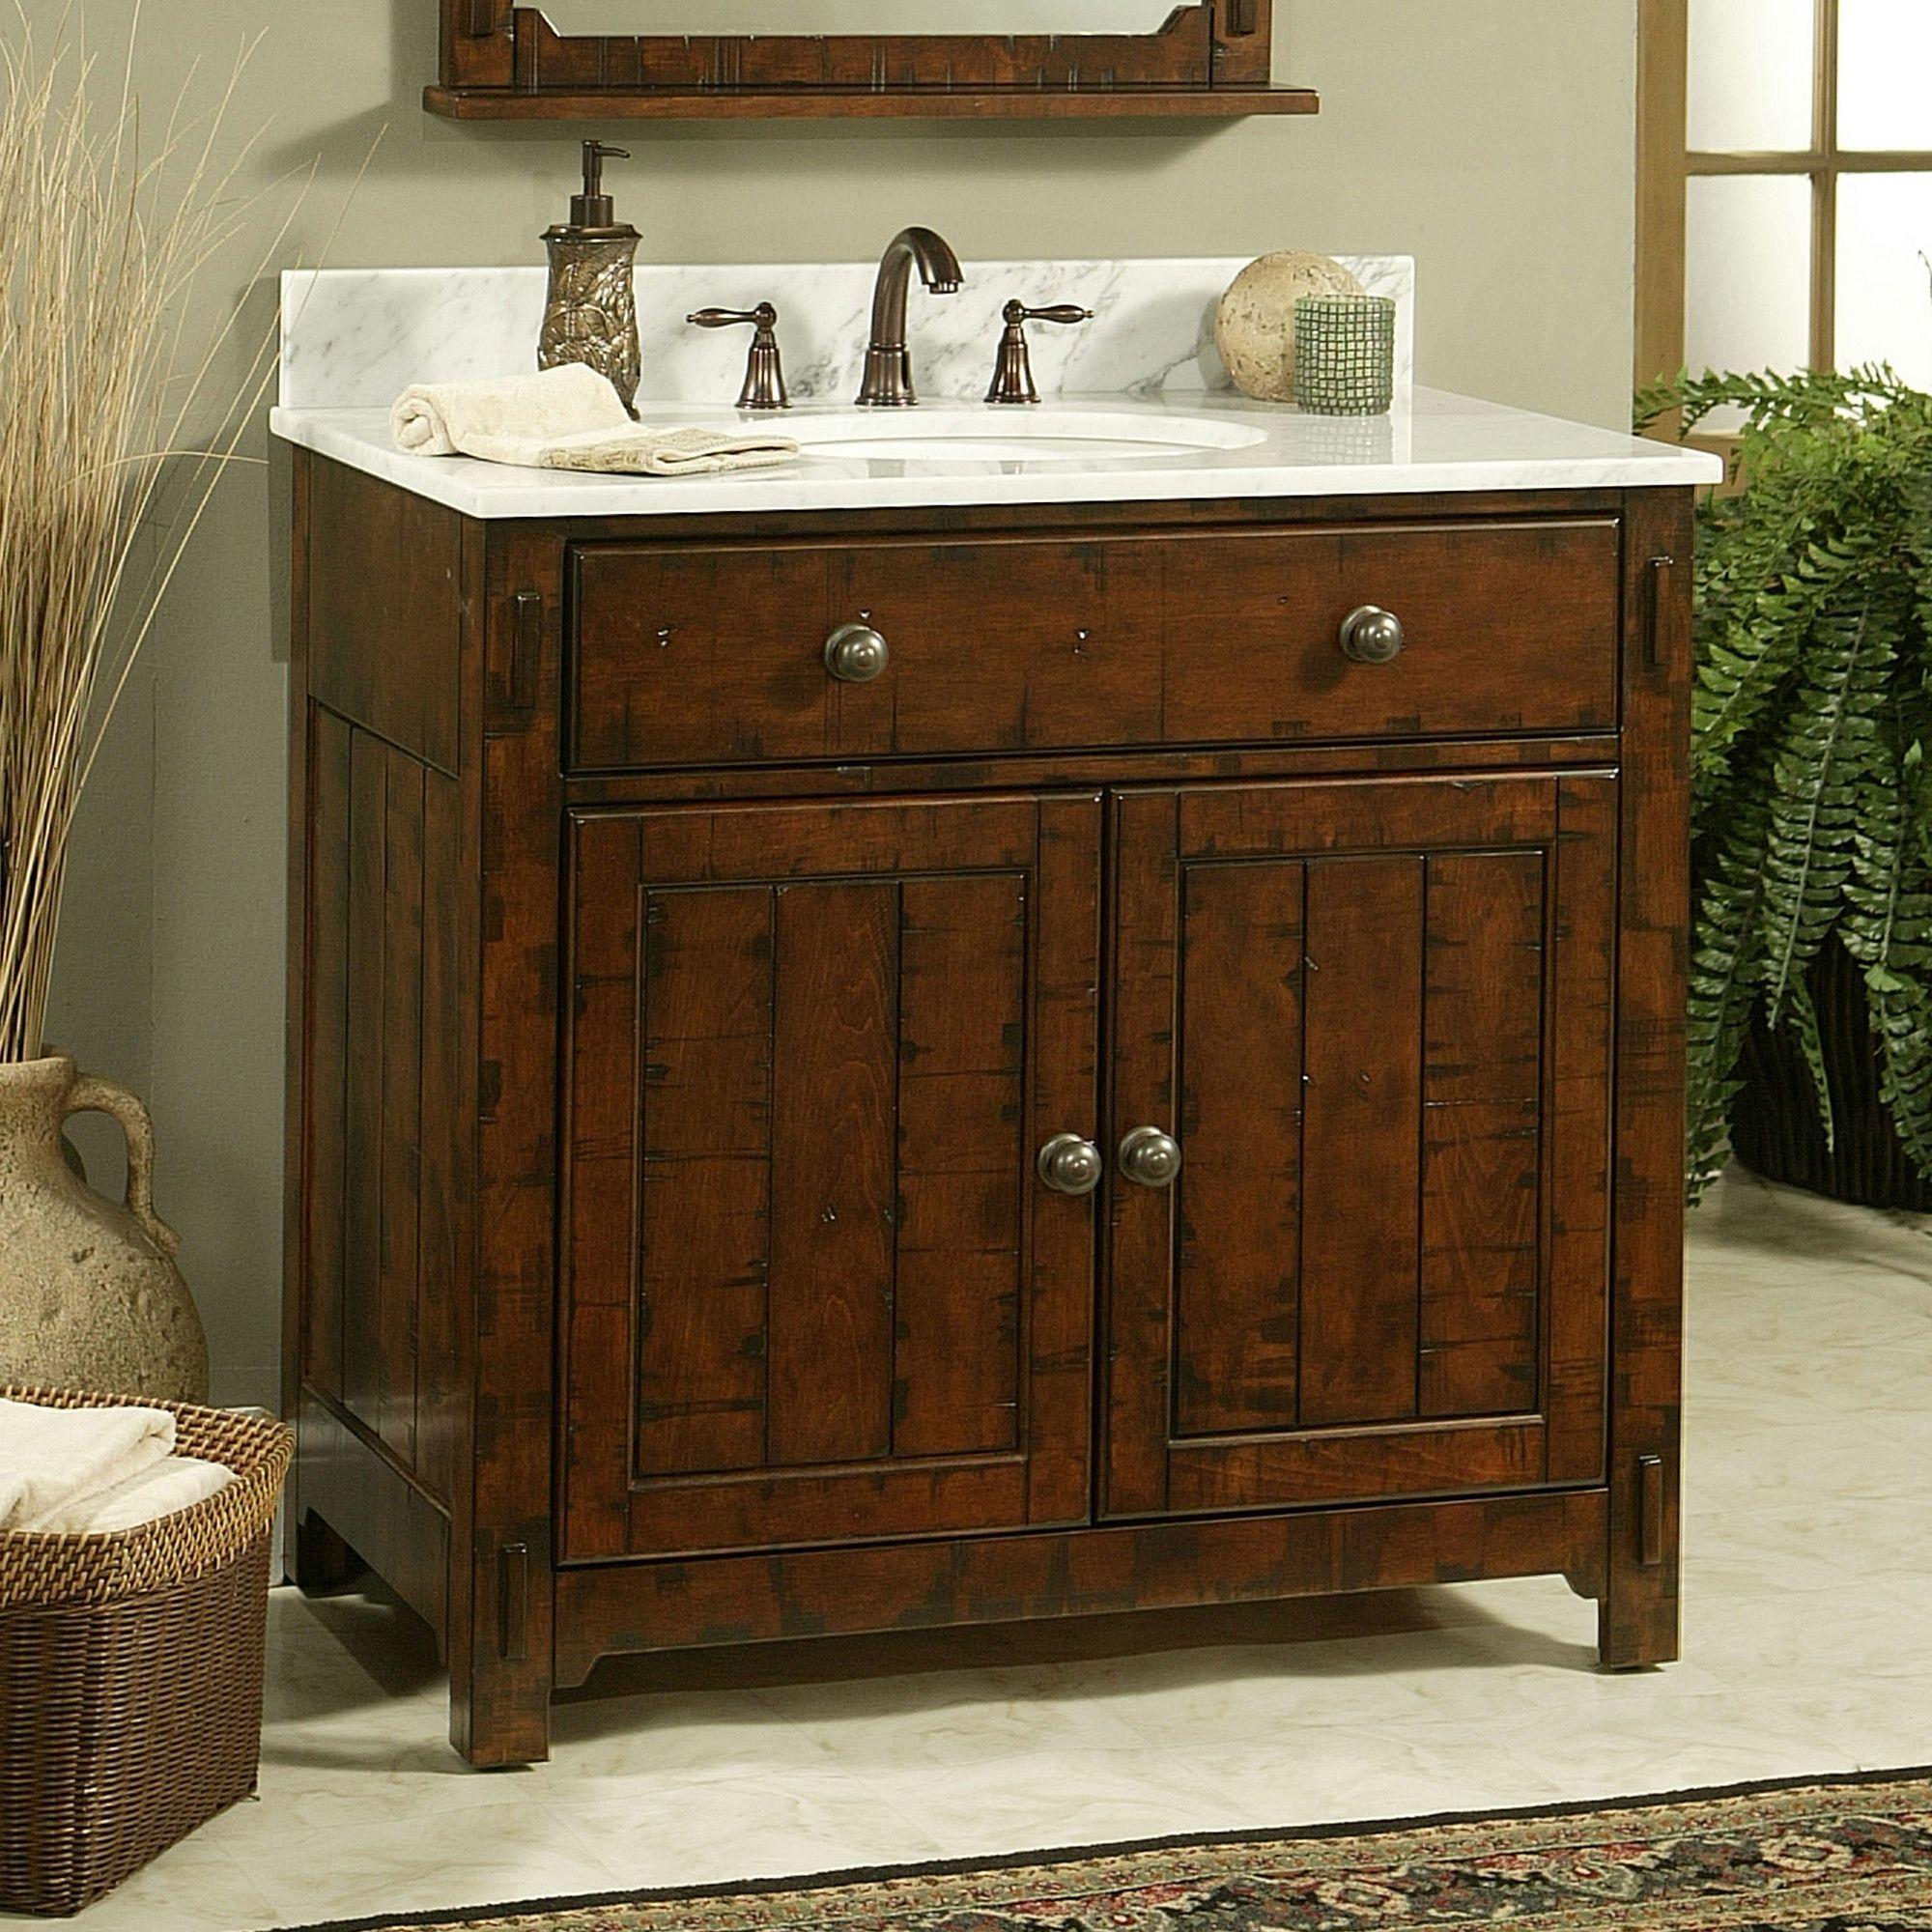 Milltown 30 Bathroom Vanity Base Bathroom Vanities Without Tops